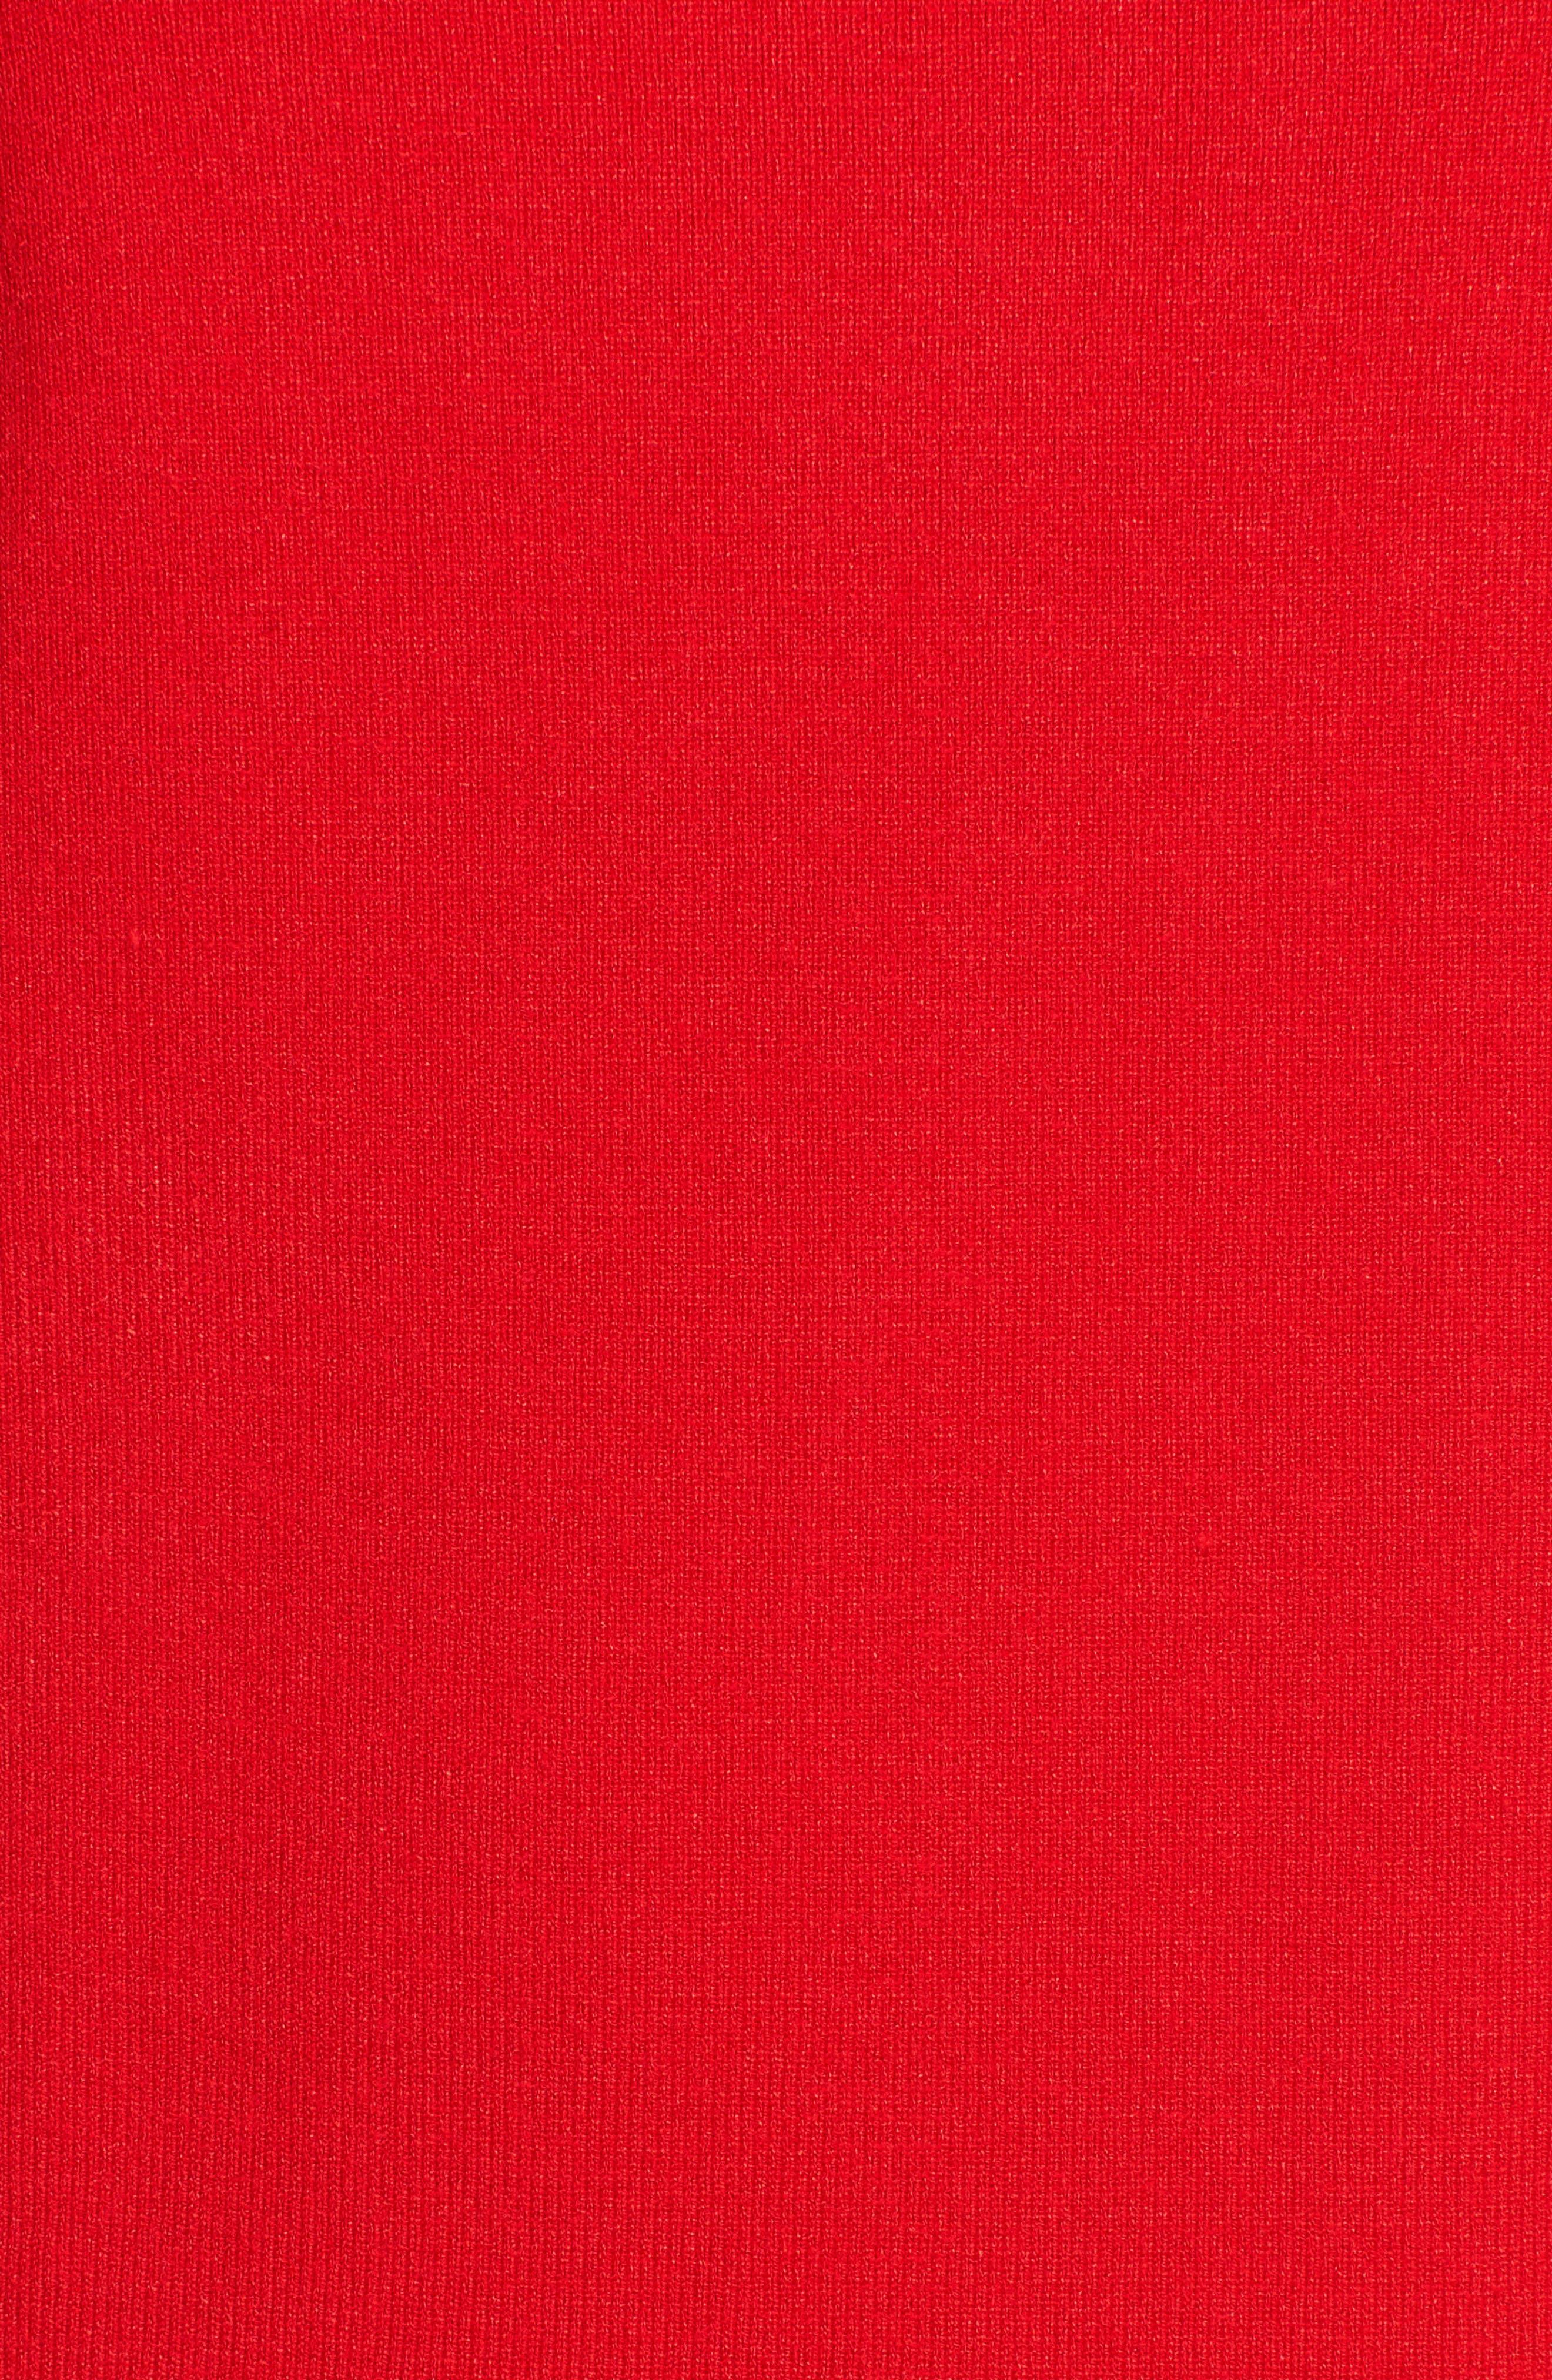 Ann Klein New York Stripe Border Knit Sheath Dress,                             Alternate thumbnail 13, color,